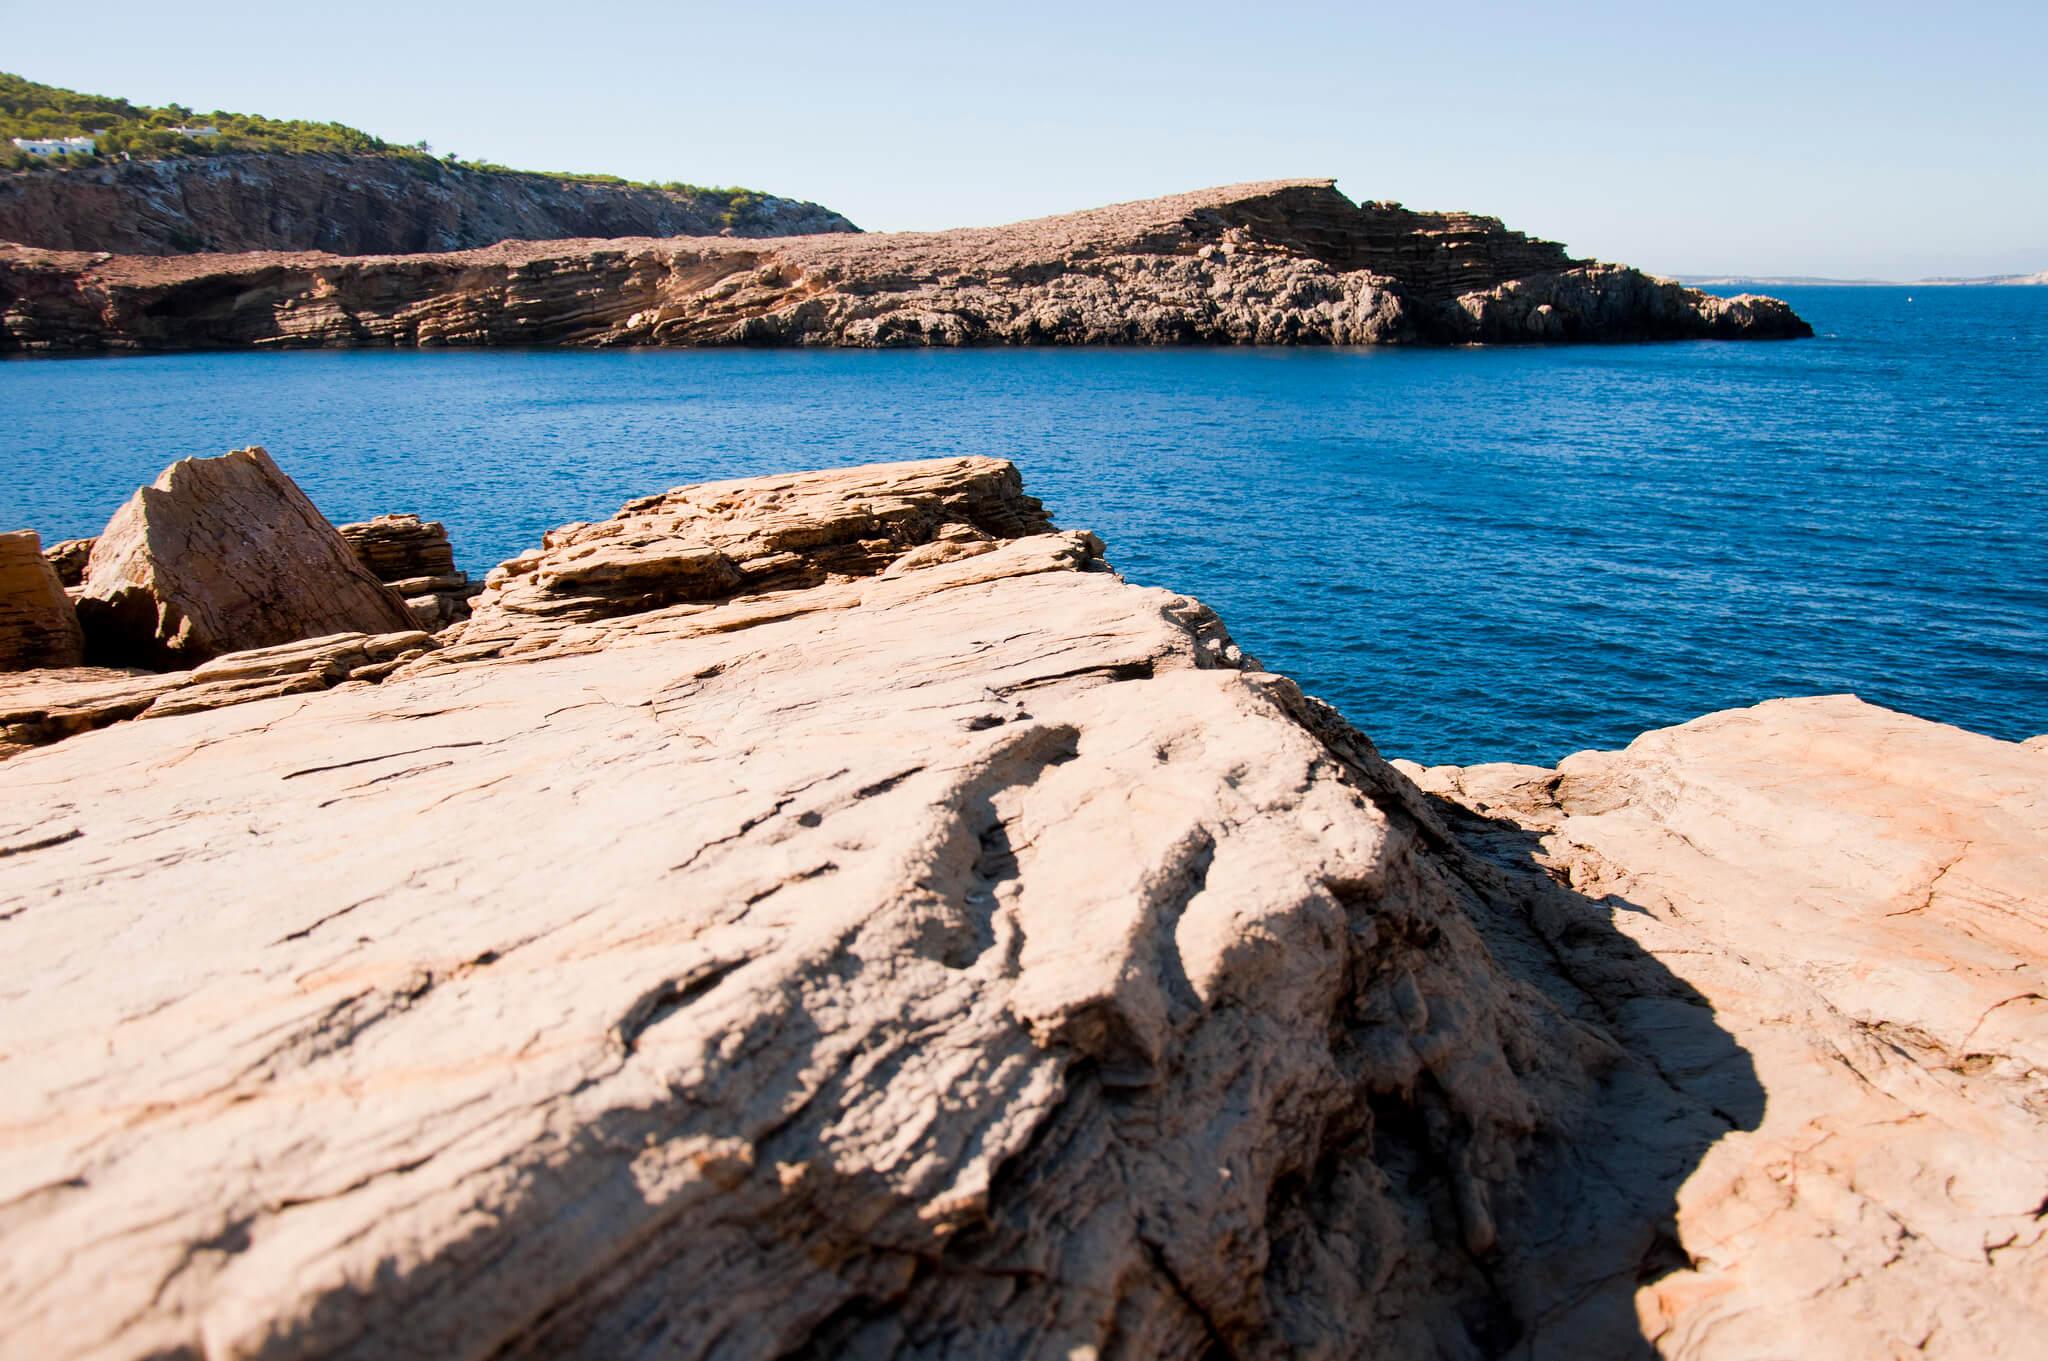 https://www.white-ibiza.com/wp-content/uploads/2020/03/ibiza-beaches-punta-galera-05.jpg